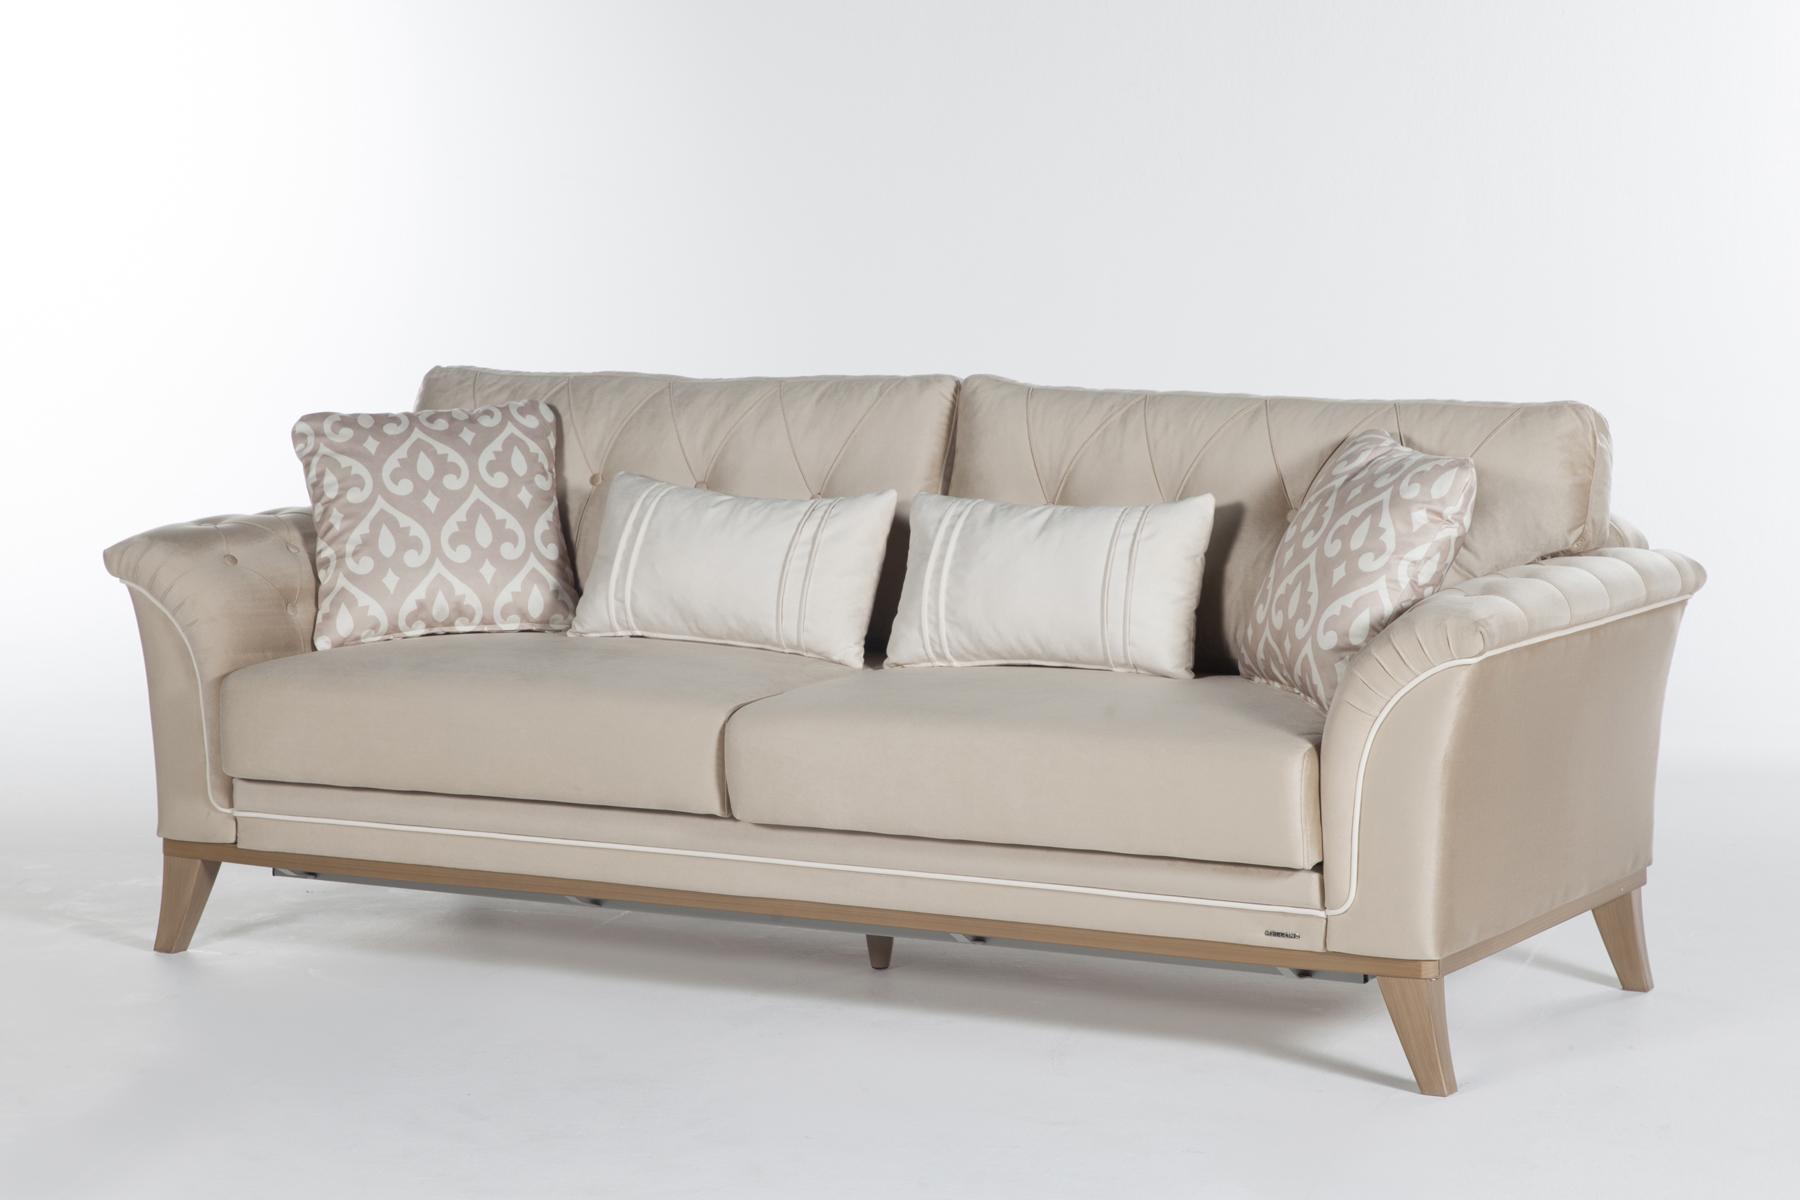 Tremendous Dekora Zero Vizon Convertible Sofa Bed By Istikbal Furniture Beatyapartments Chair Design Images Beatyapartmentscom